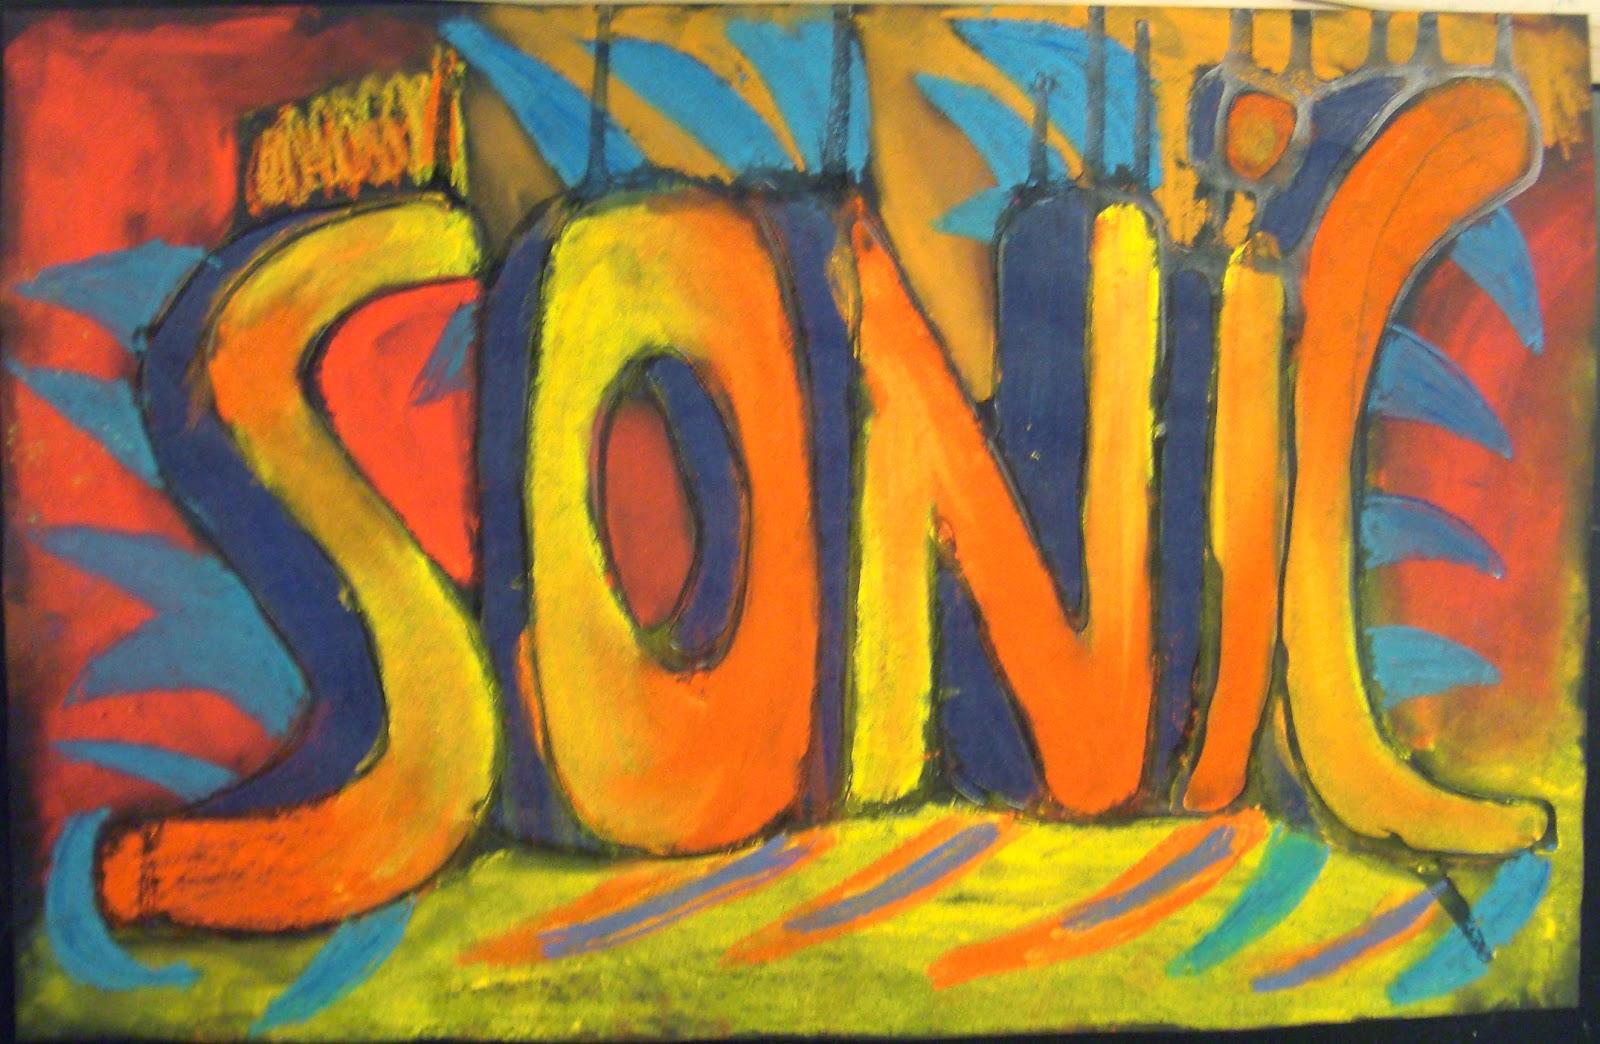 Y Graffiti Letters Art Every Way: Pastel ...